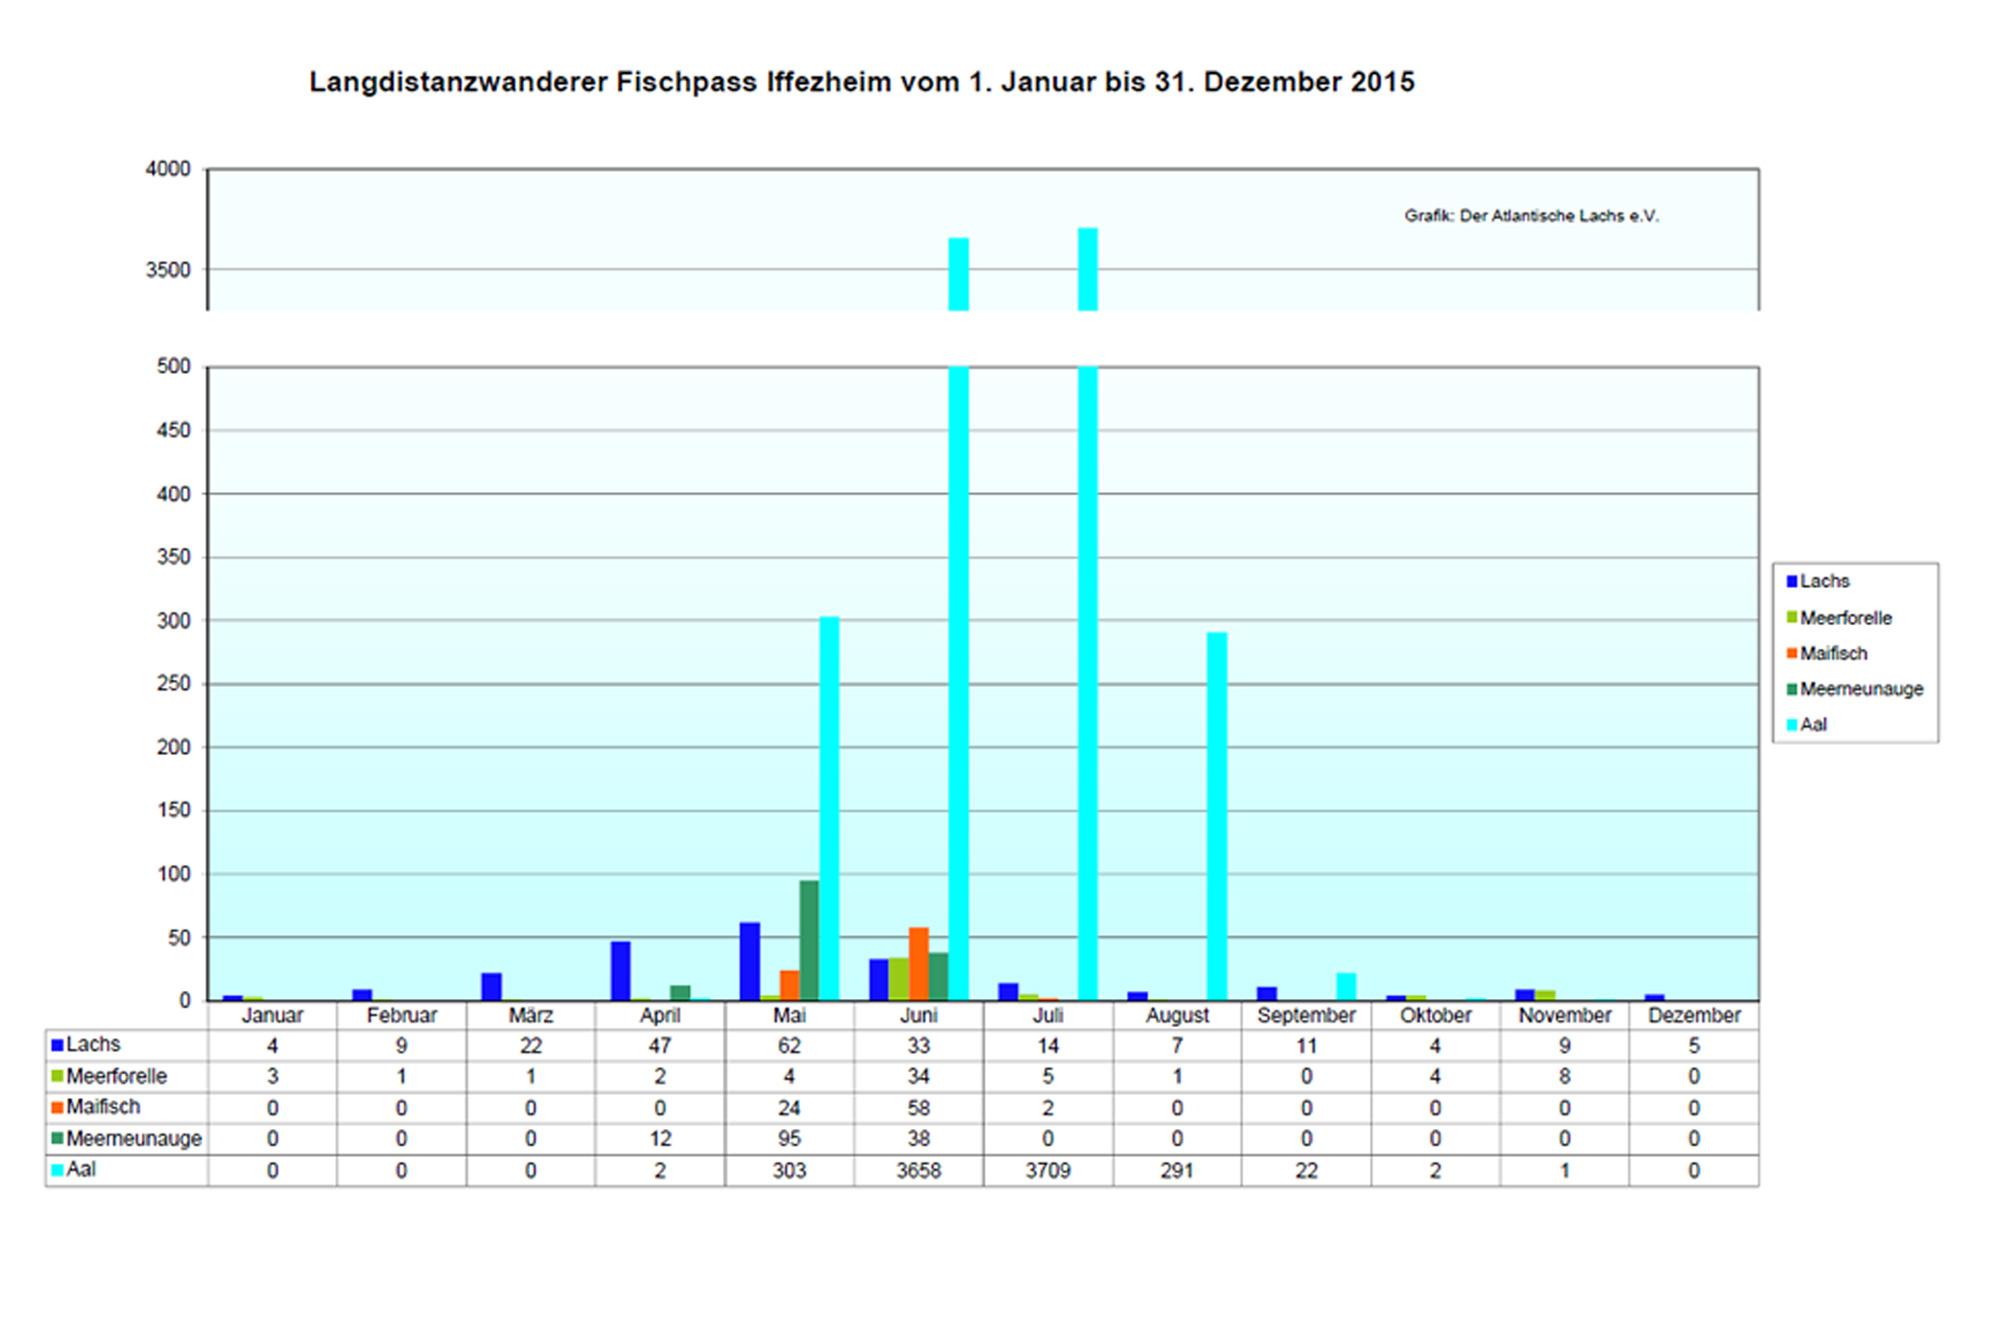 Rückkehrerstatistik Iffezheim 2015